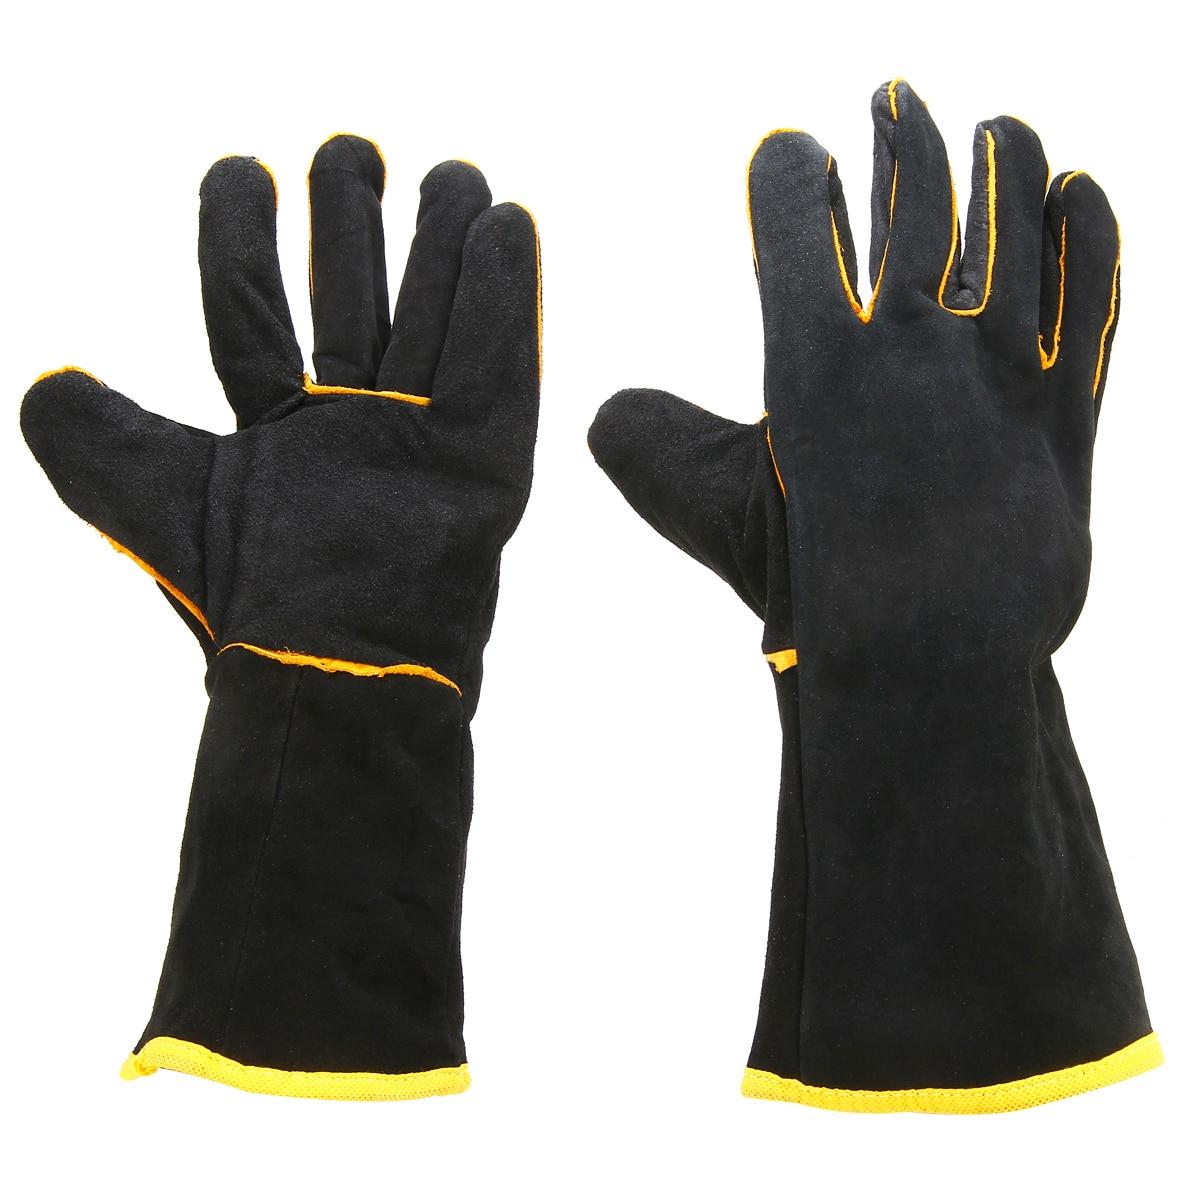 Heavy Duty Welding Protective Gloves 1 Pair Welders Leather Cowhide Gloves Black Mig Welding Soldering Gloves Gauntlets